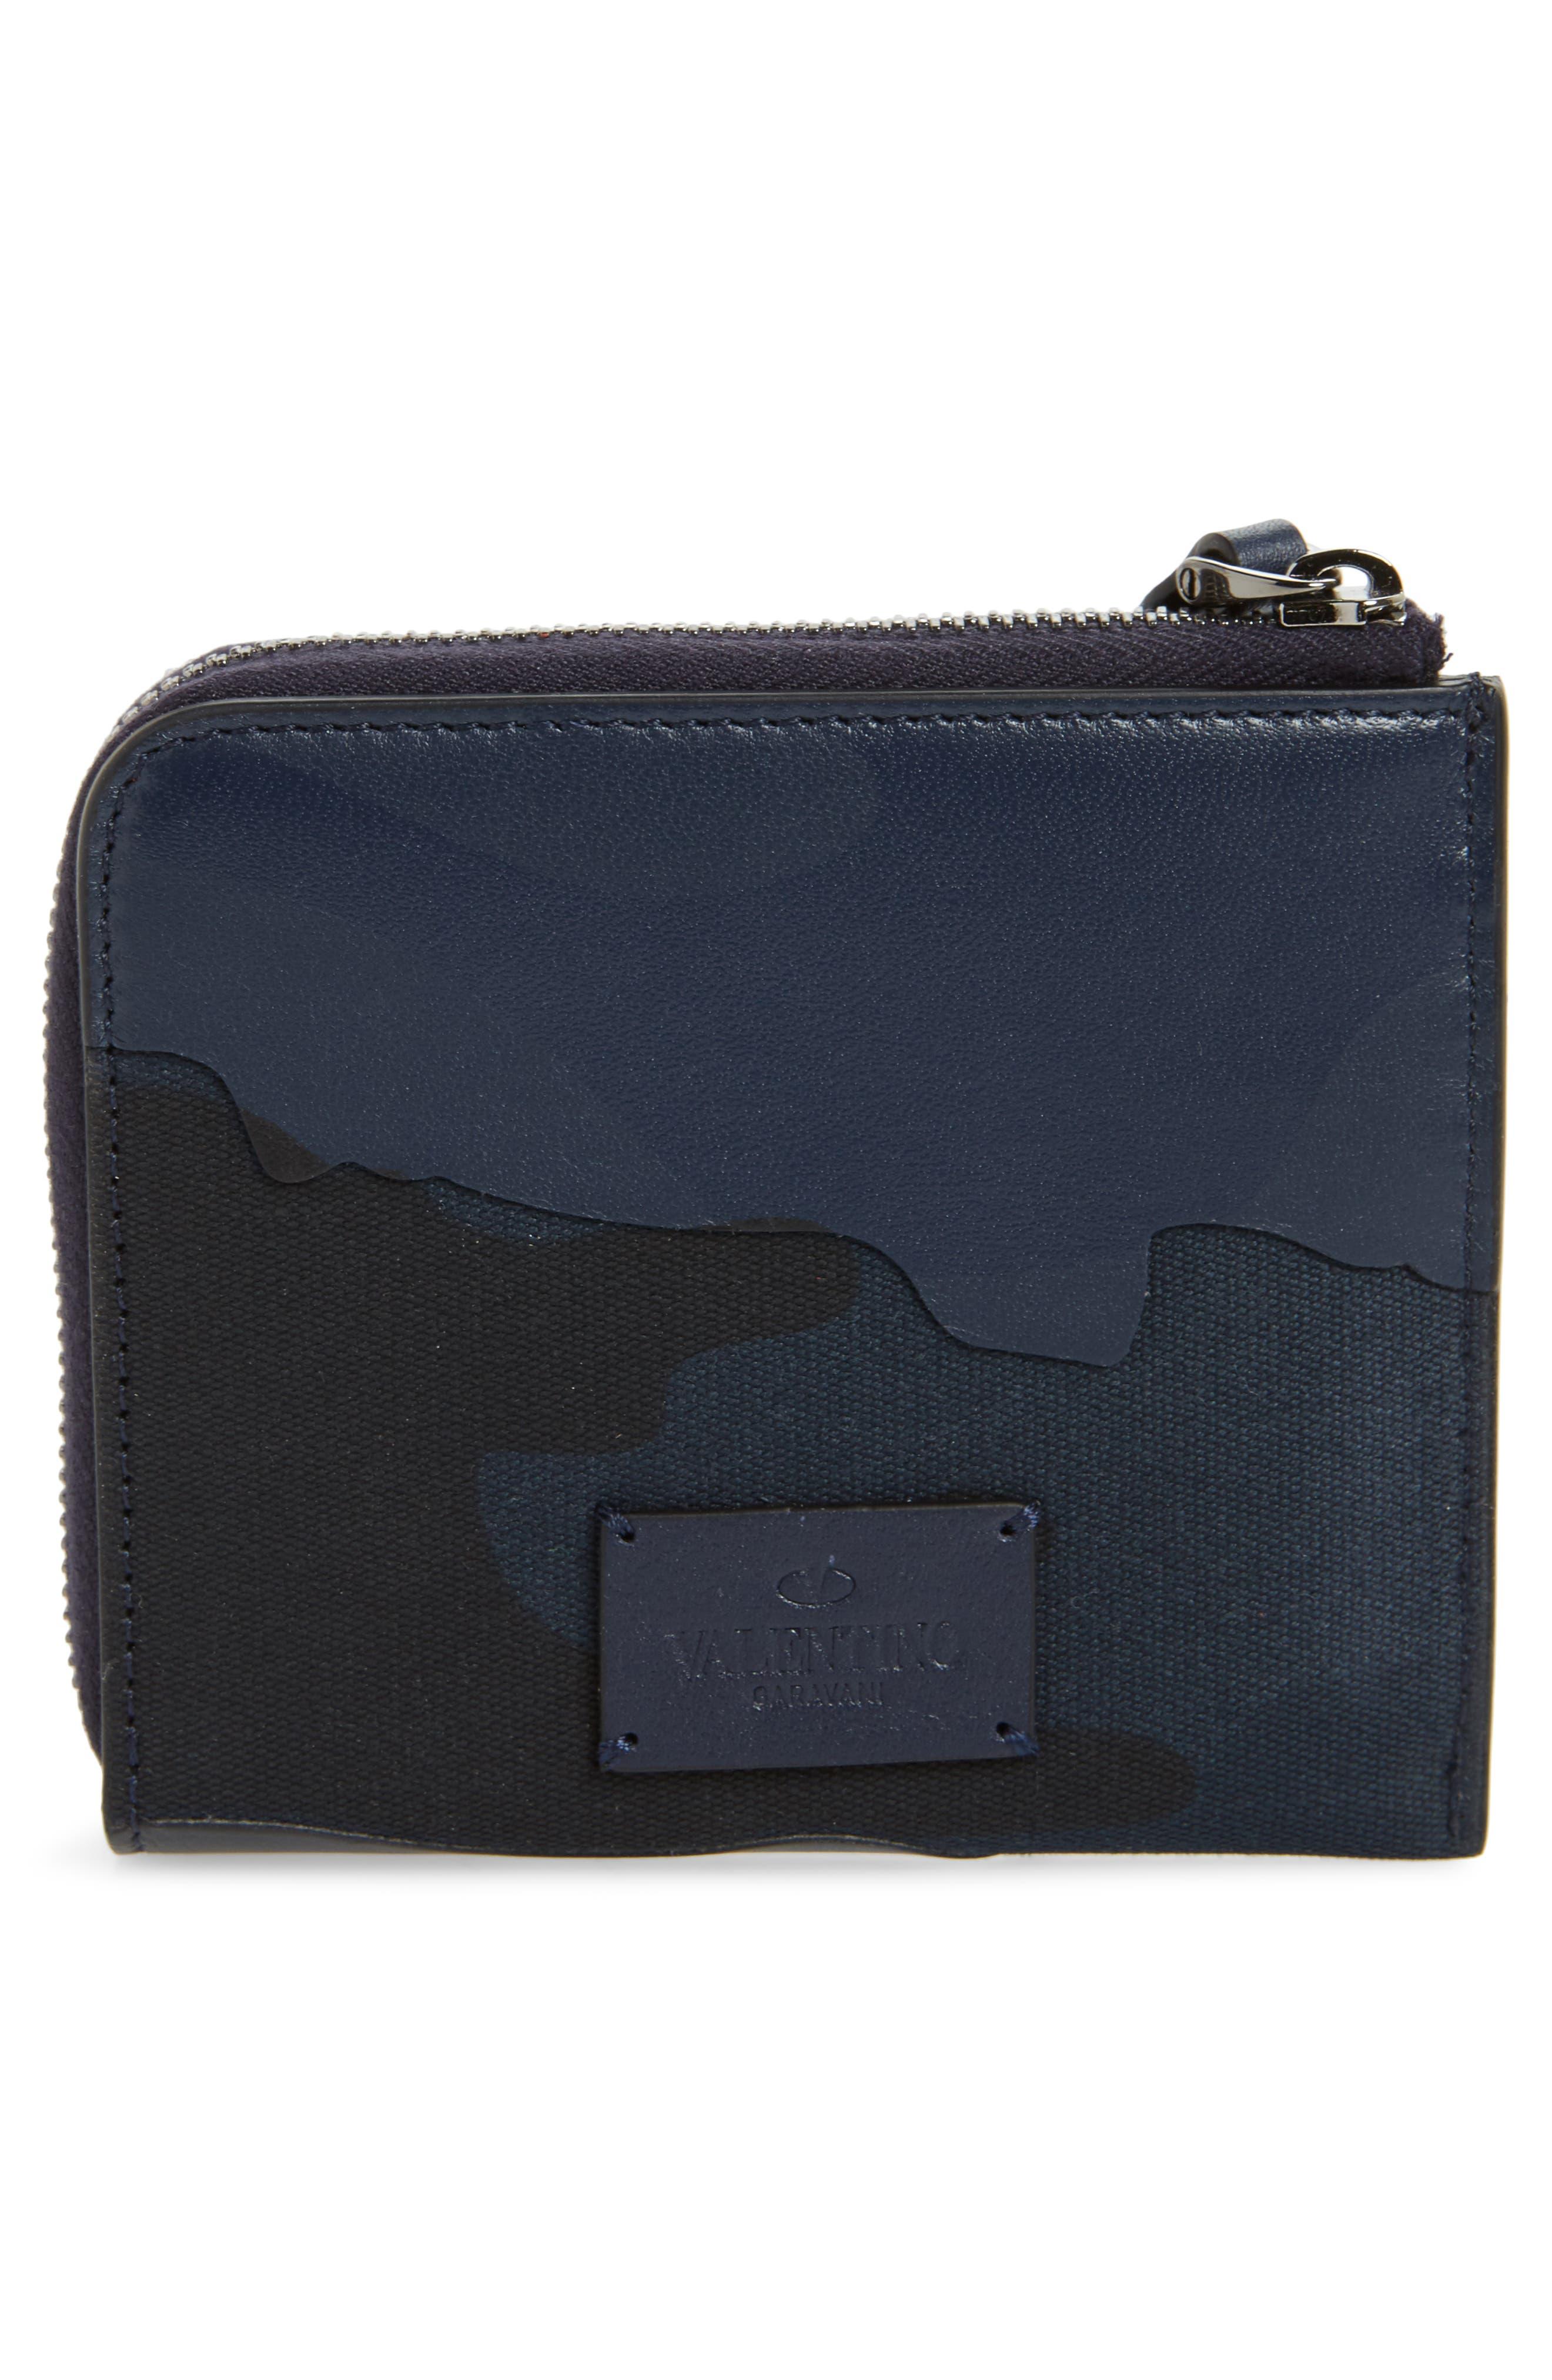 GARAVANI Camo Zip Wallet,                             Alternate thumbnail 3, color,                             MARINE